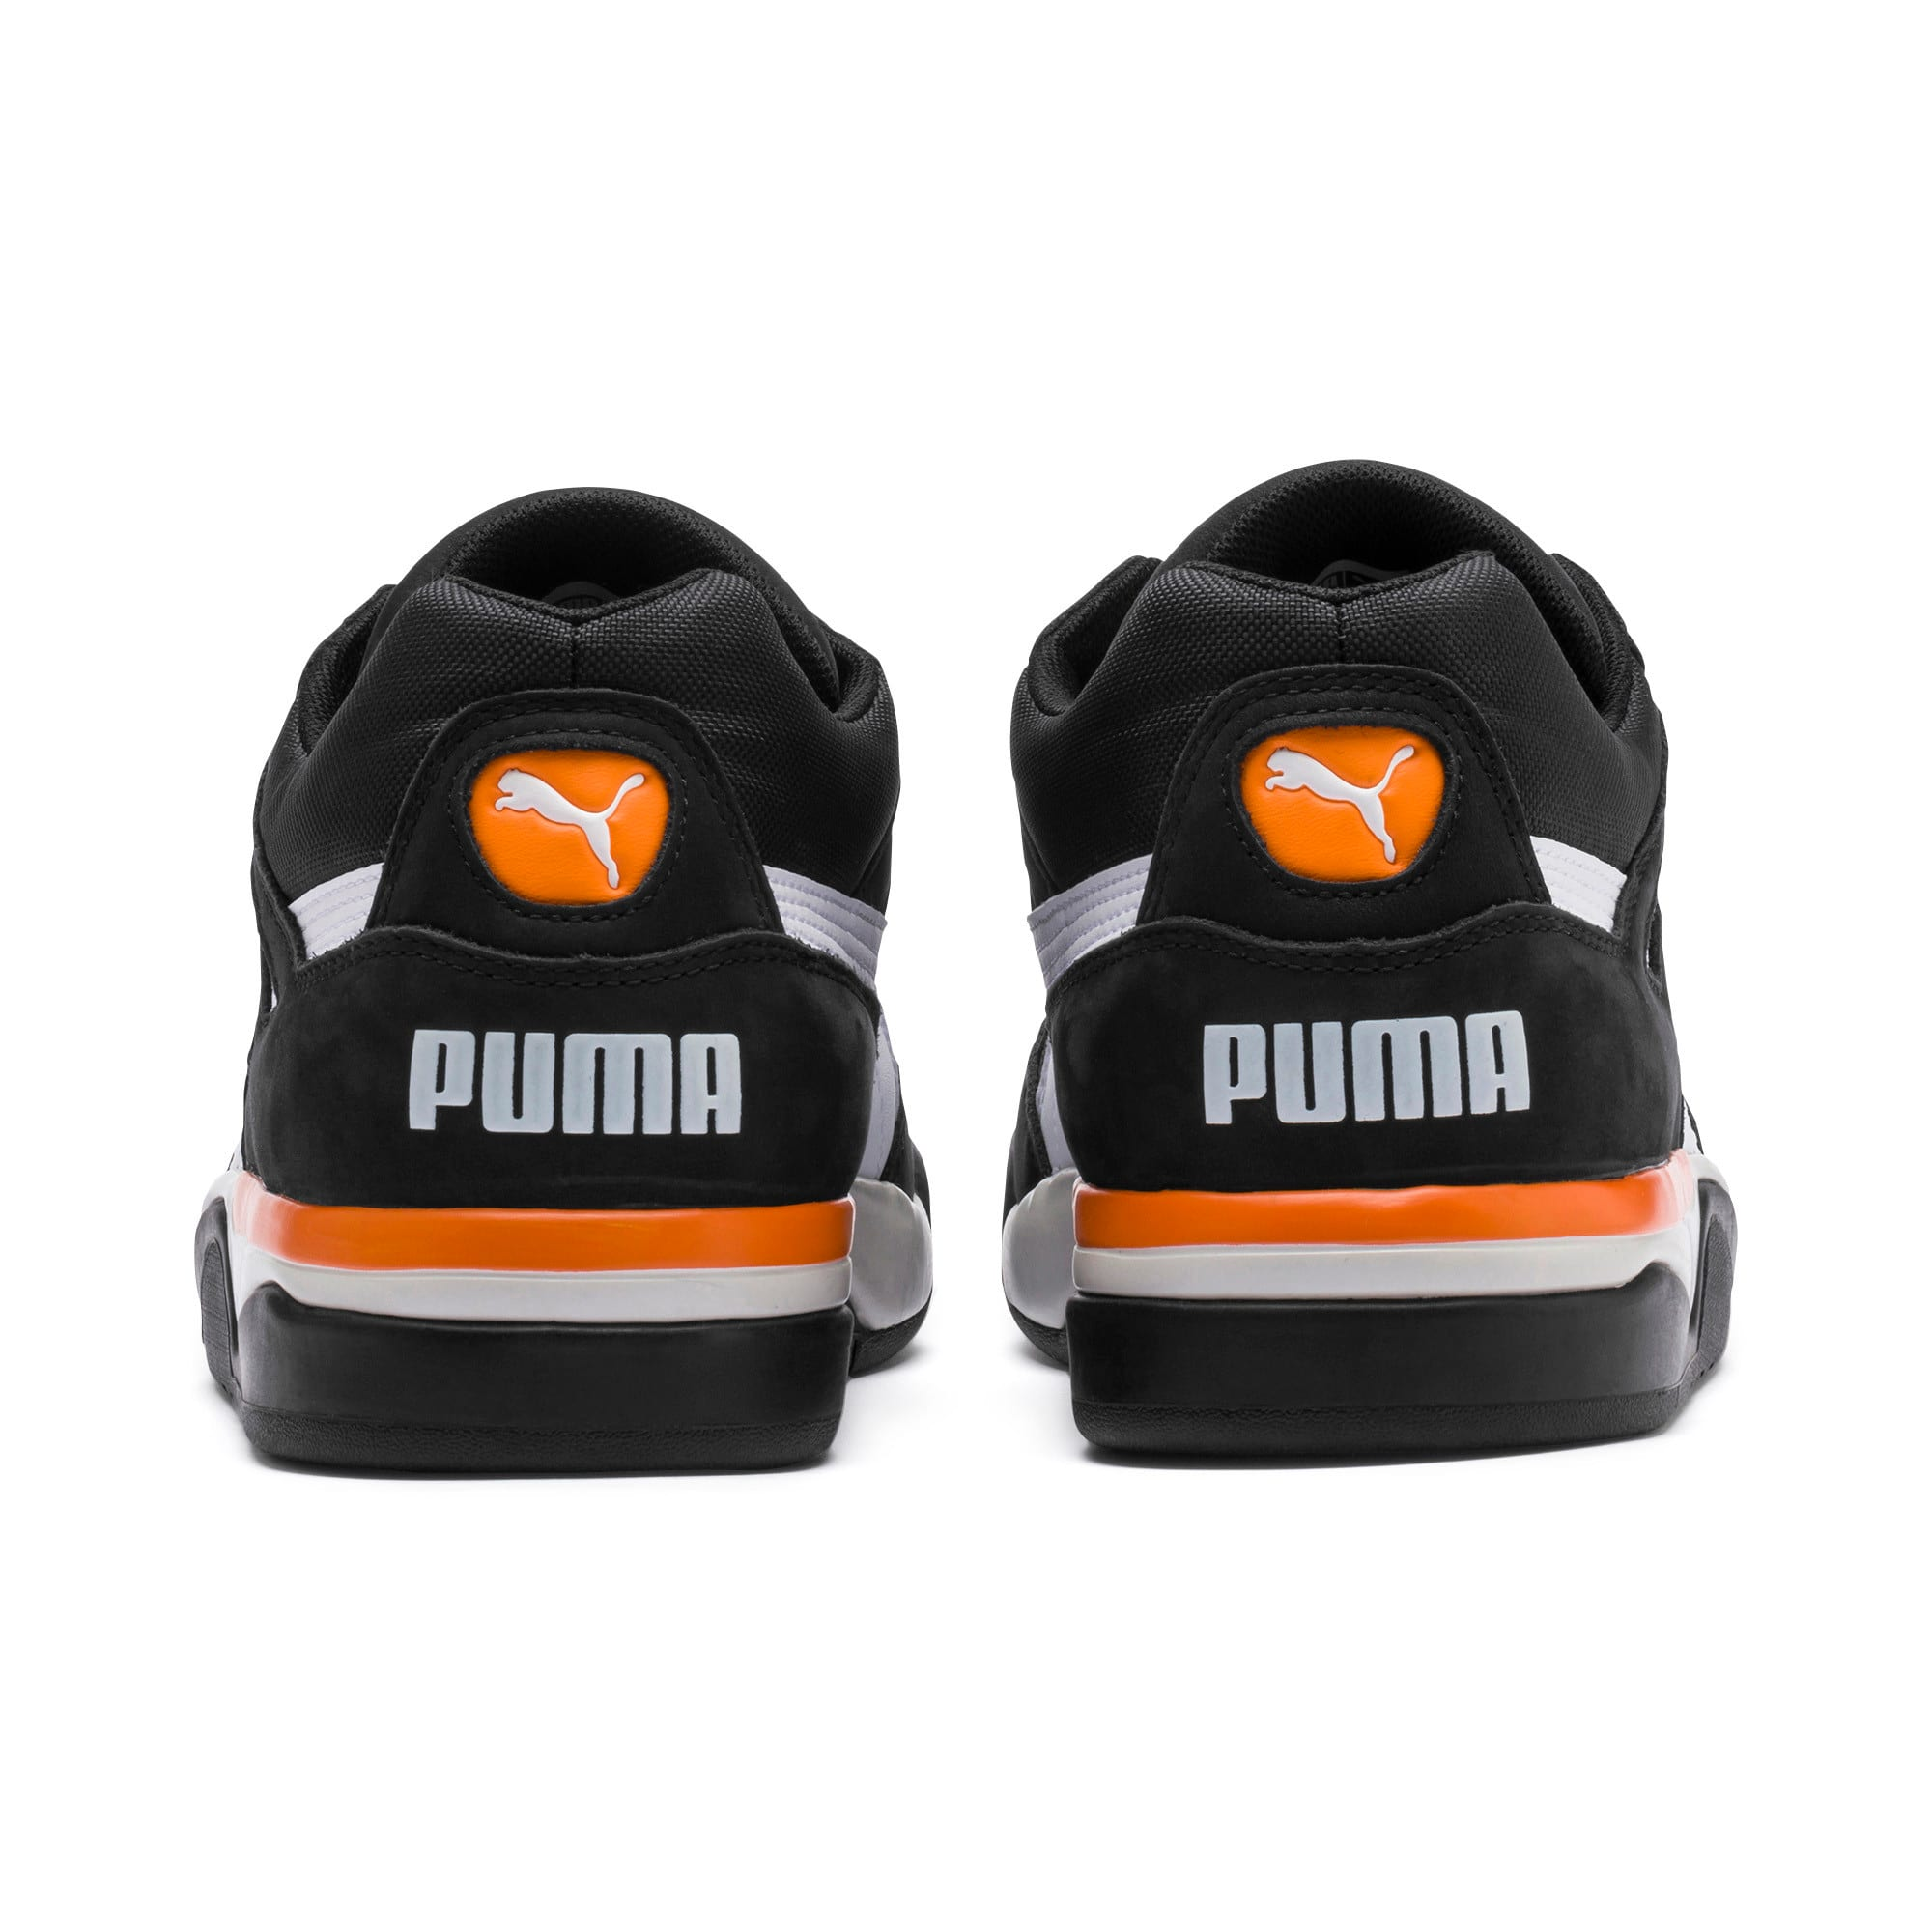 Thumbnail 3 of Palace Guard Bad Boys Sneaker, Puma Black-Puma White-, medium